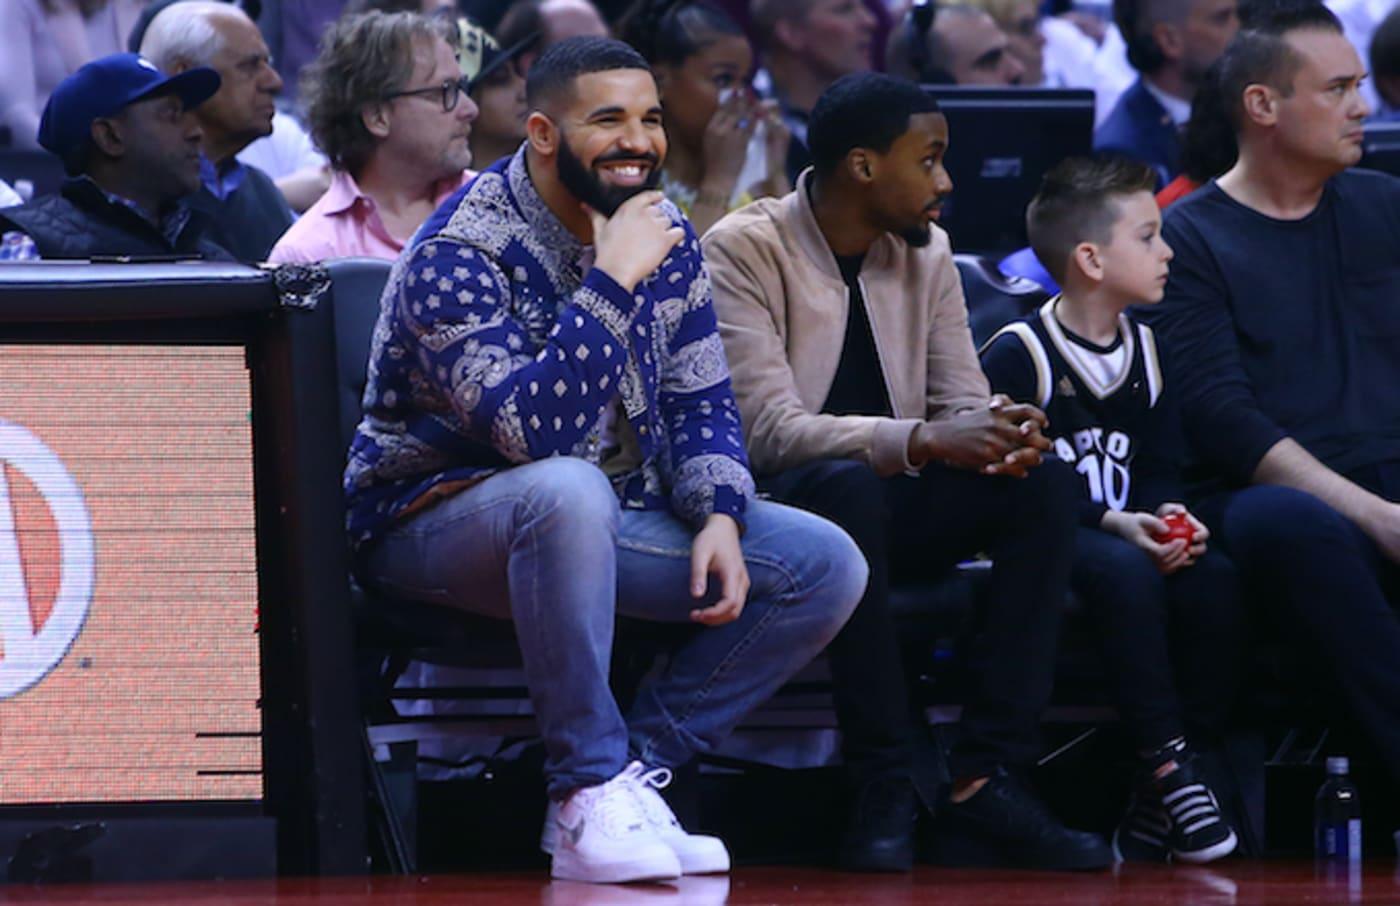 Drake sits courtside during 76ers/Raptors 2019 NBA Playoffs game. .